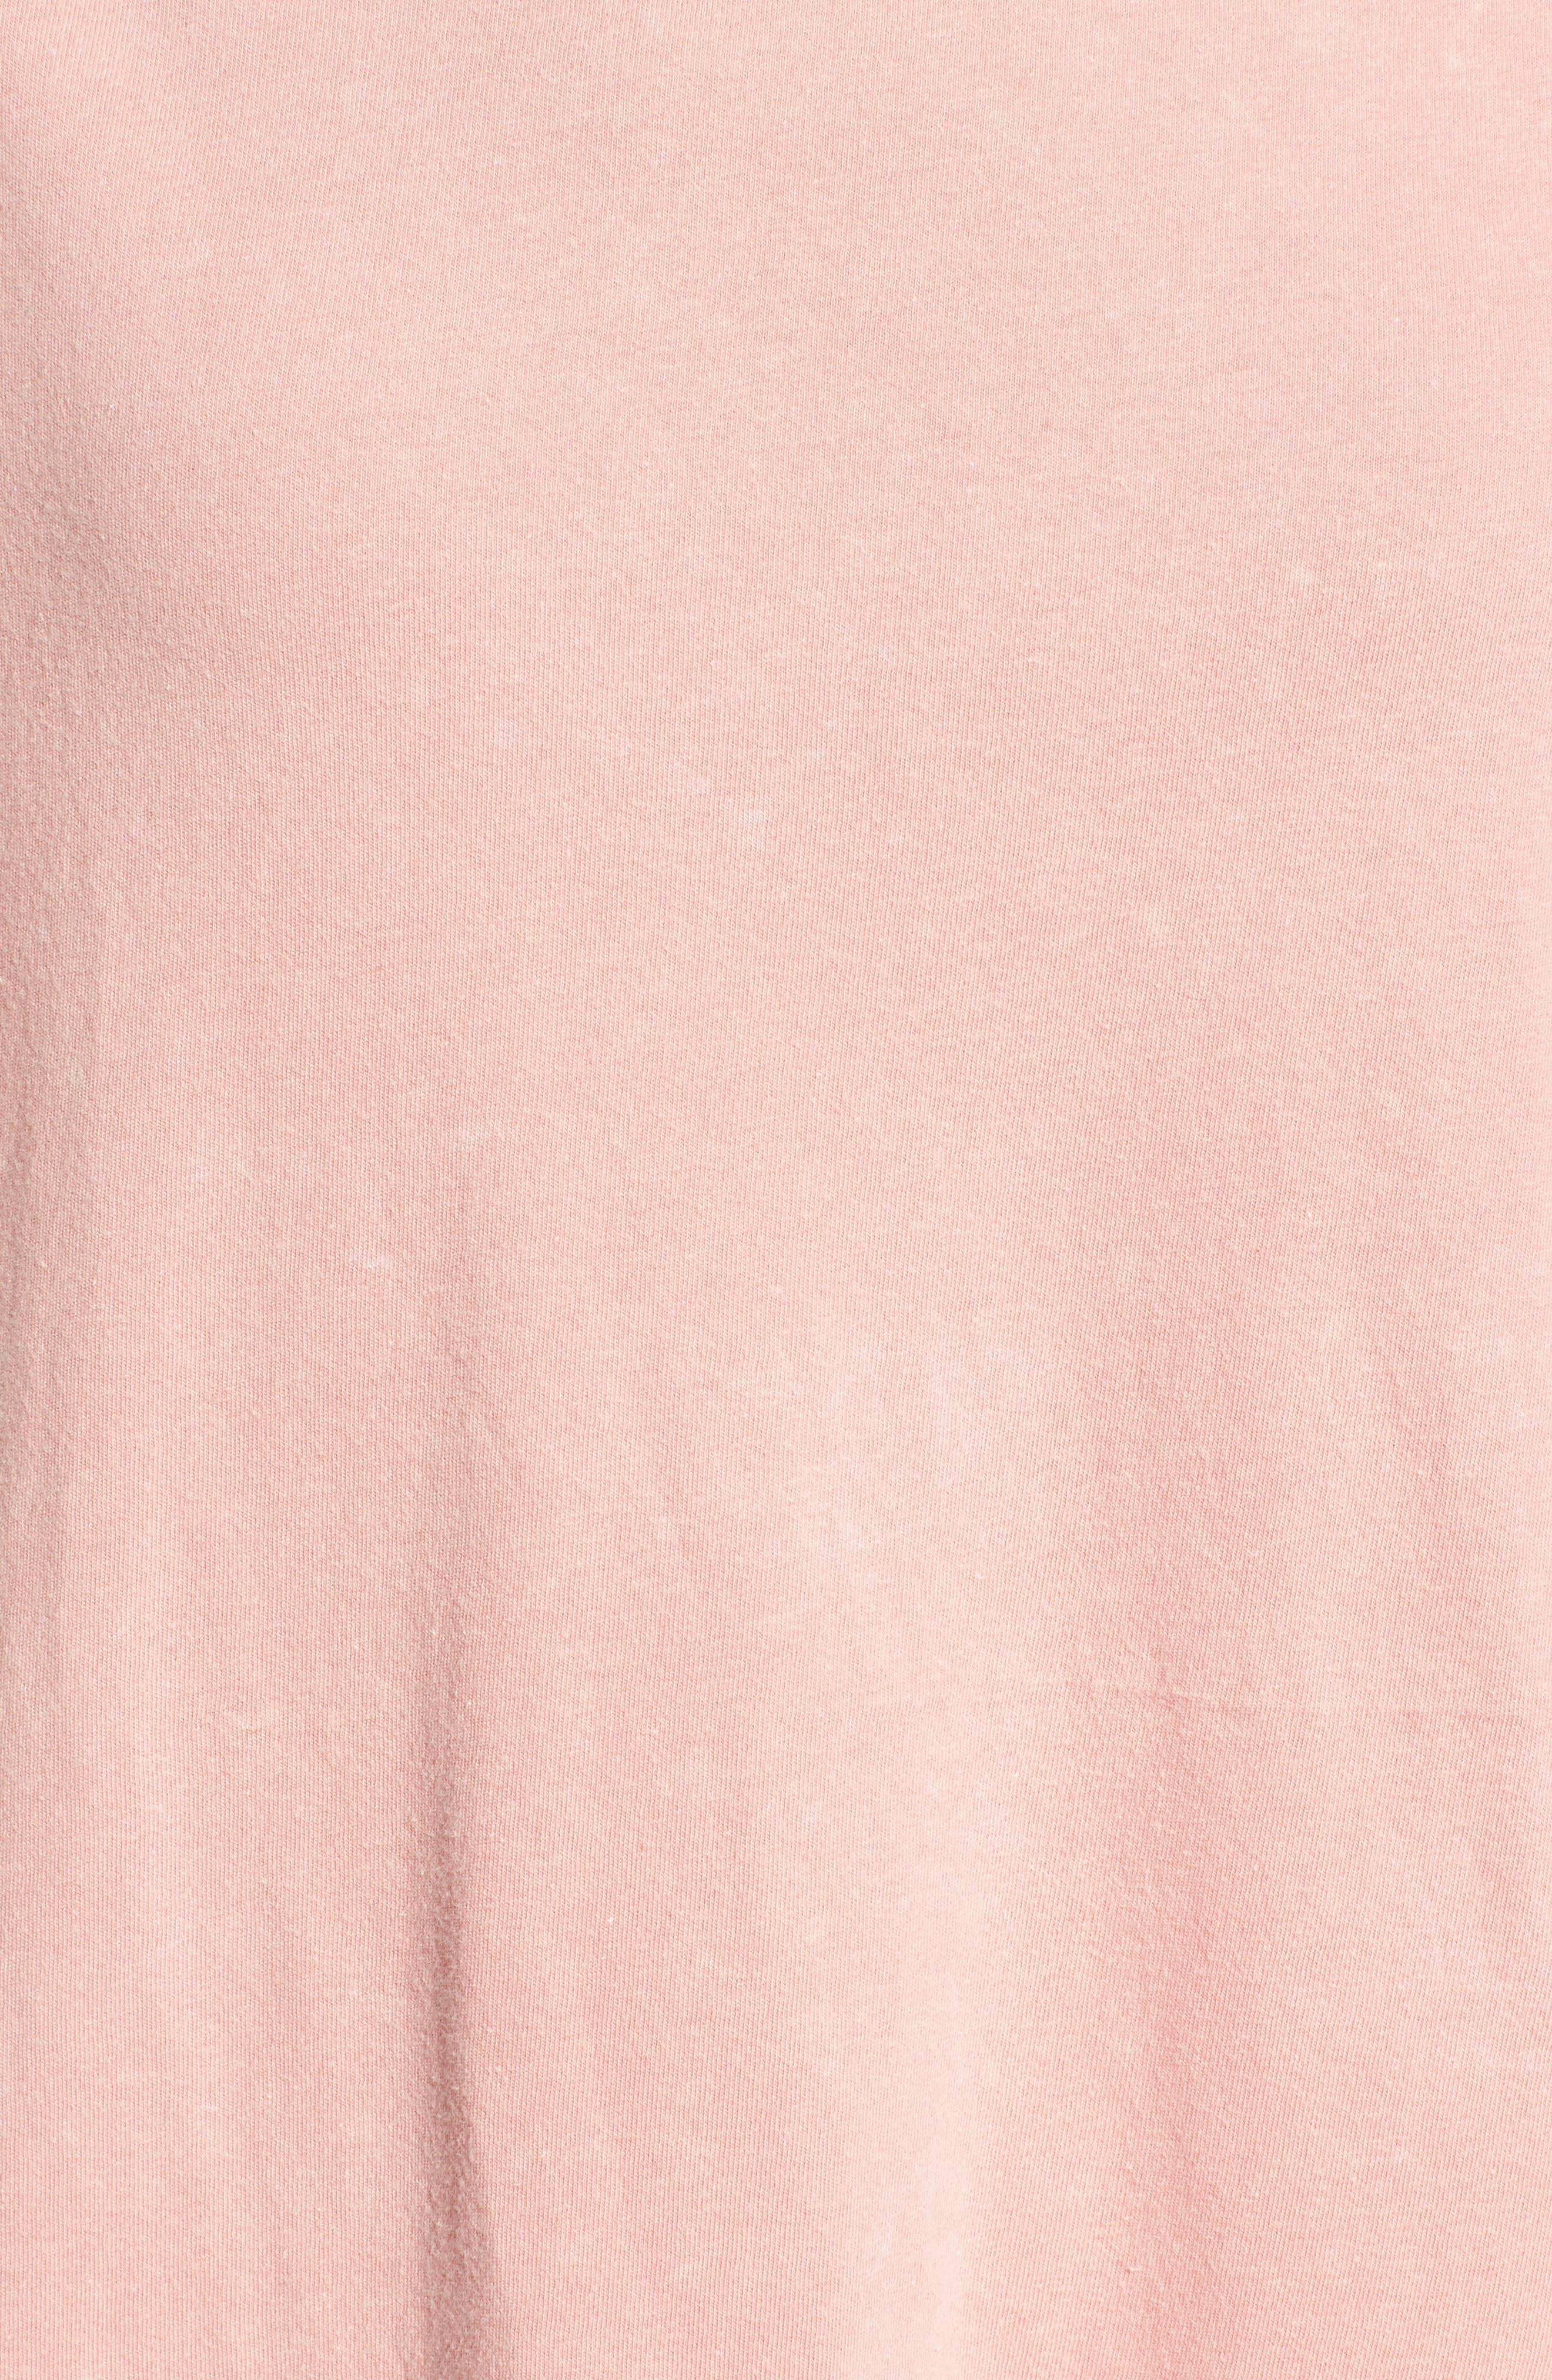 Stonewash Ruffle Trim Dress,                             Alternate thumbnail 5, color,                             Pink Dawn